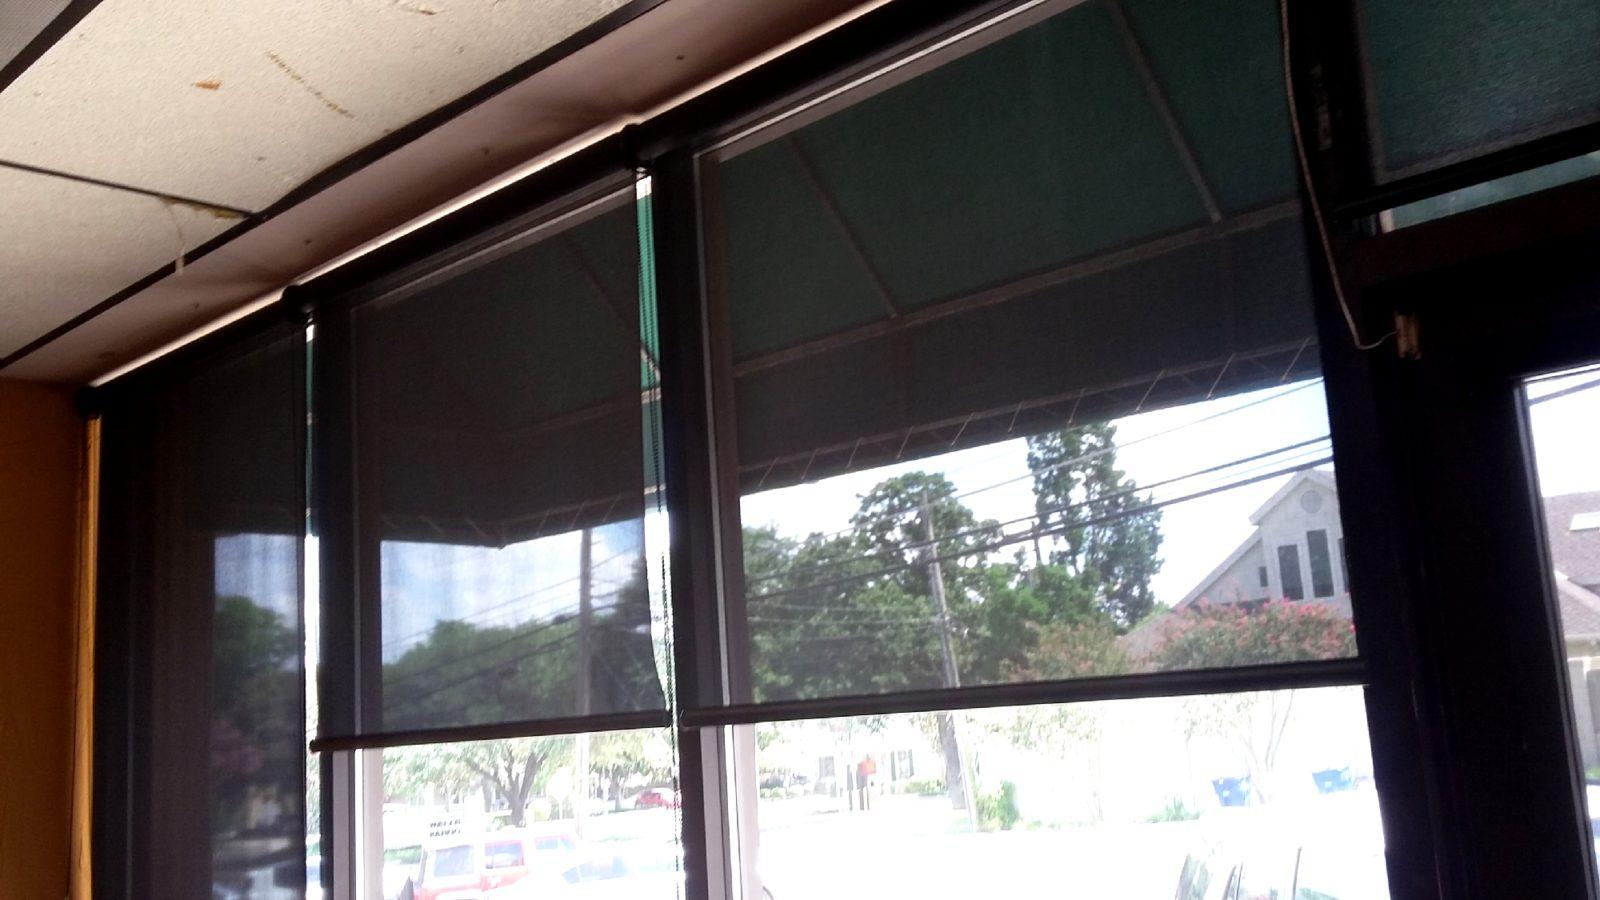 Commercial Roll Shades Solar Screens By Josh Austin Tx